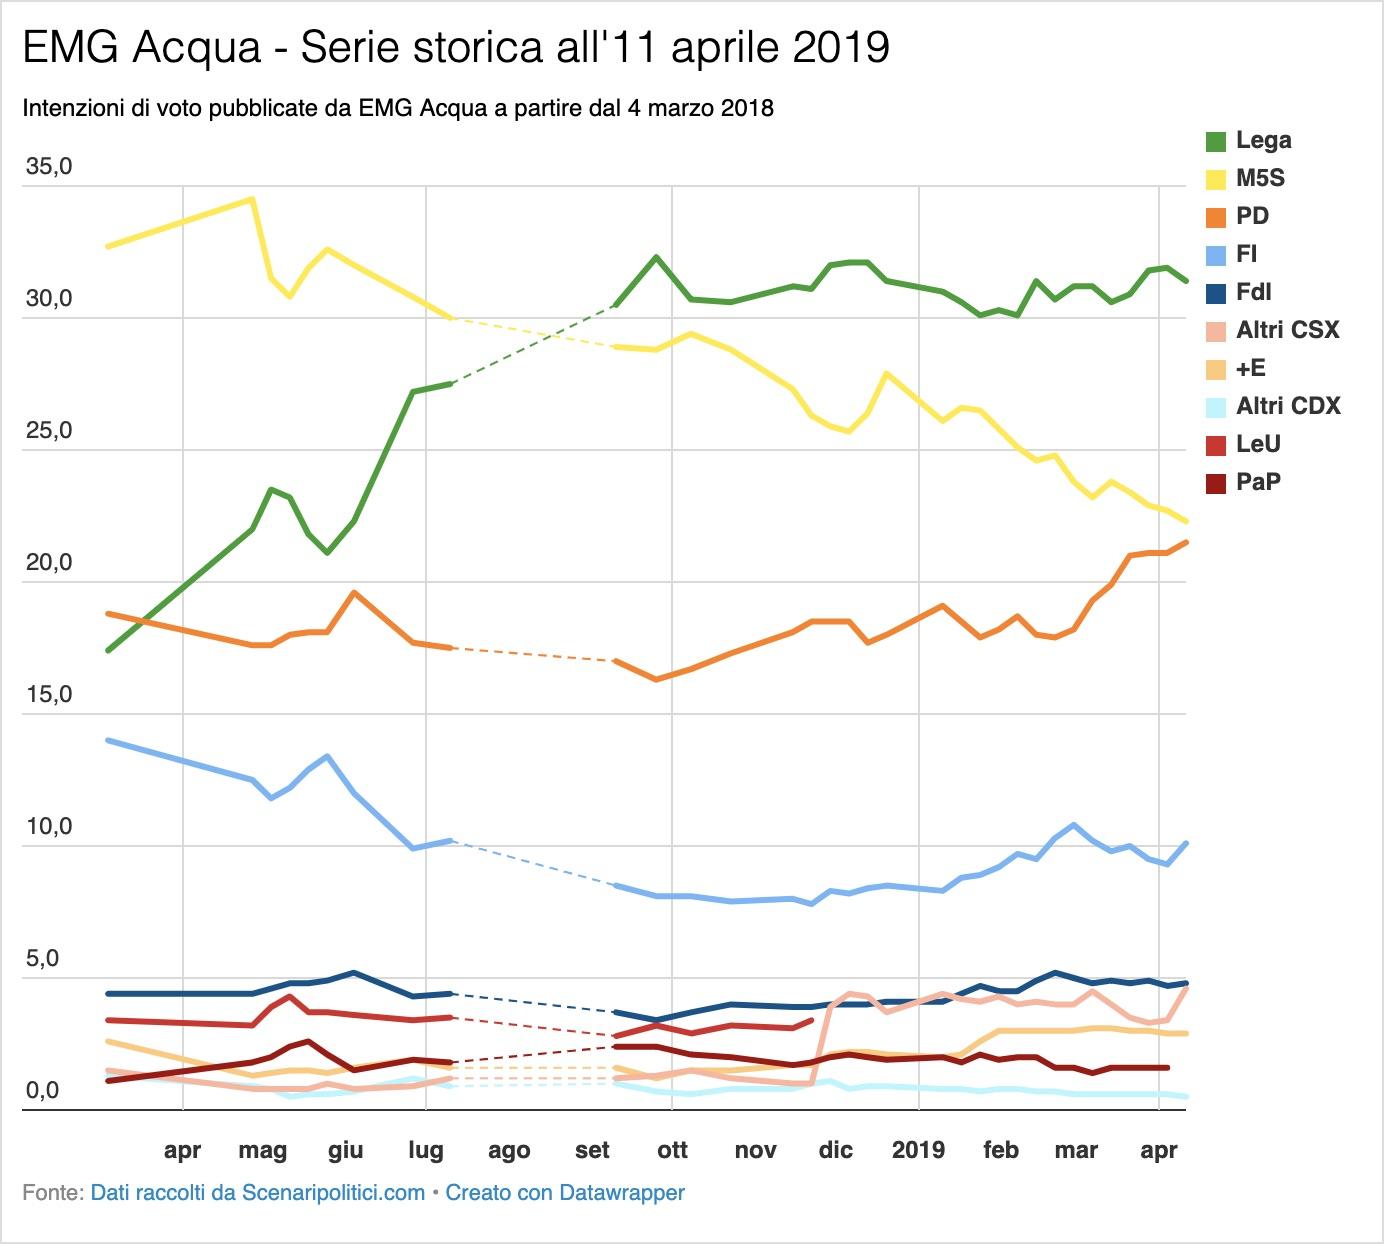 Sondaggio EMG Acqua 11 aprile 2019